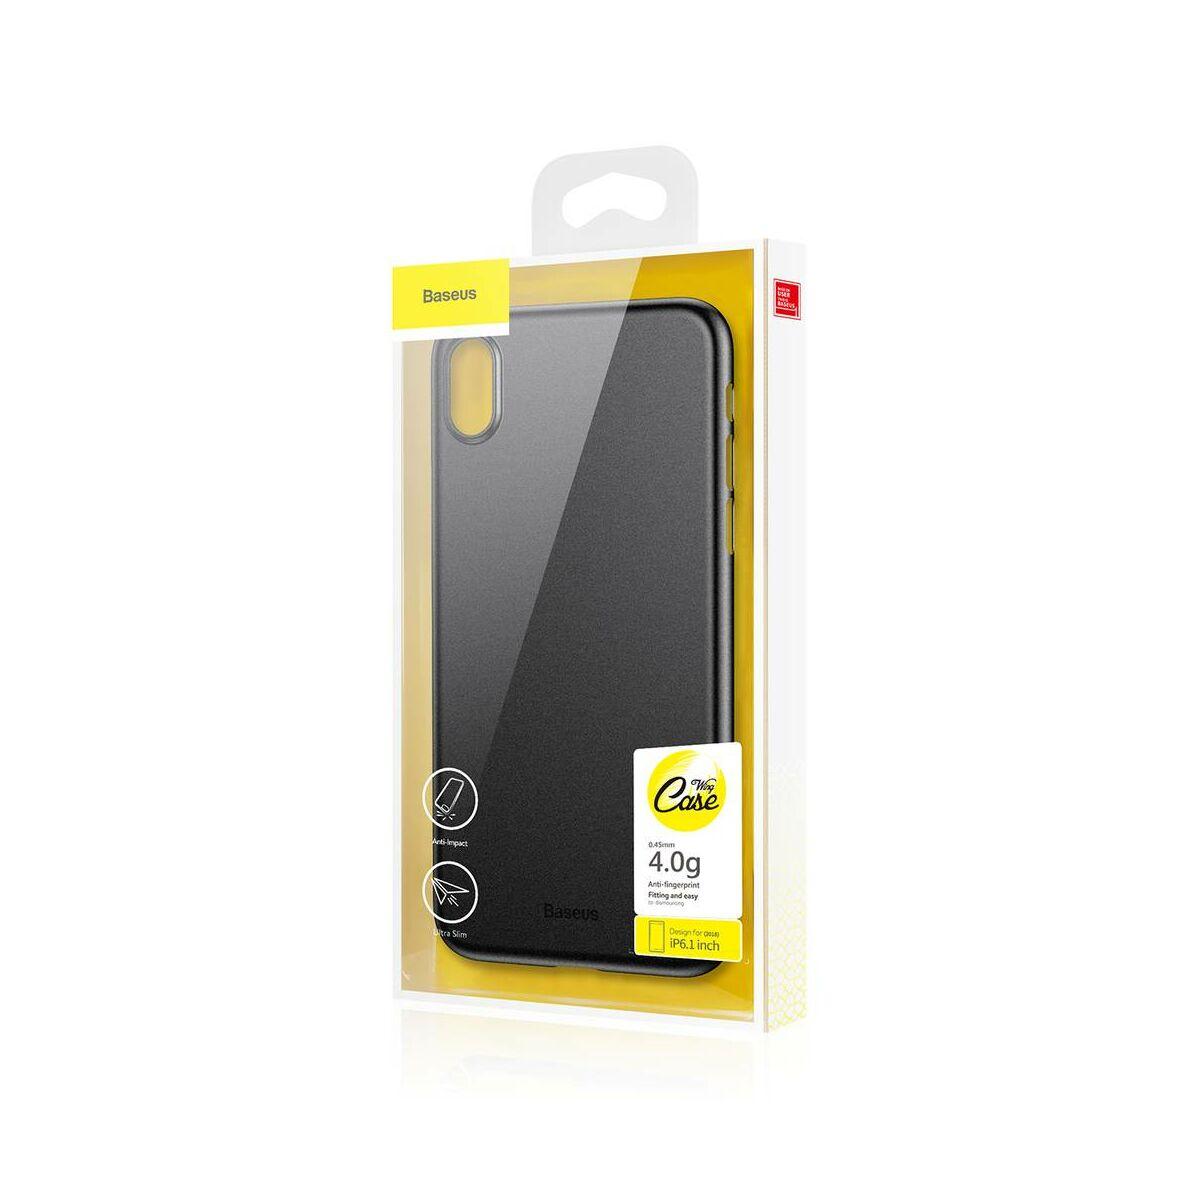 Baseus iPhone XR tok, Wing, fekete (WIAPIPH61-EA1)